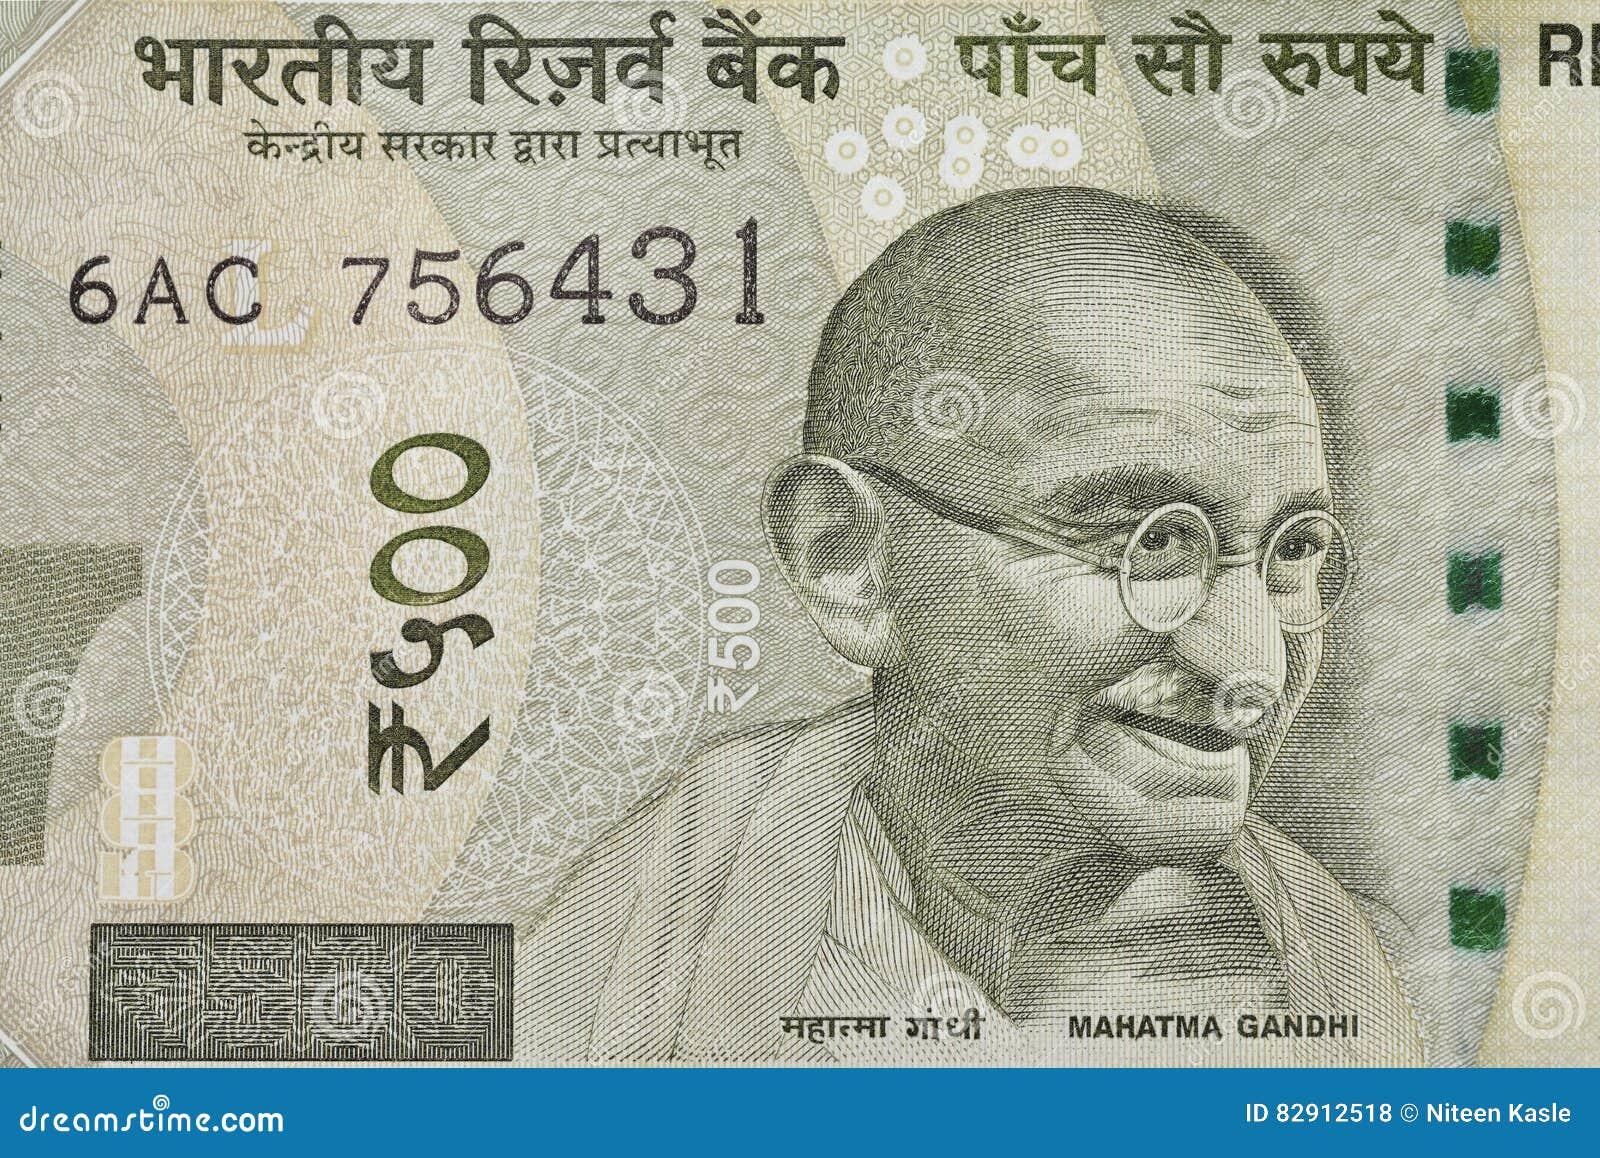 Indian Five Hundred Rupee Note With Mahatma Gandhi Portrait